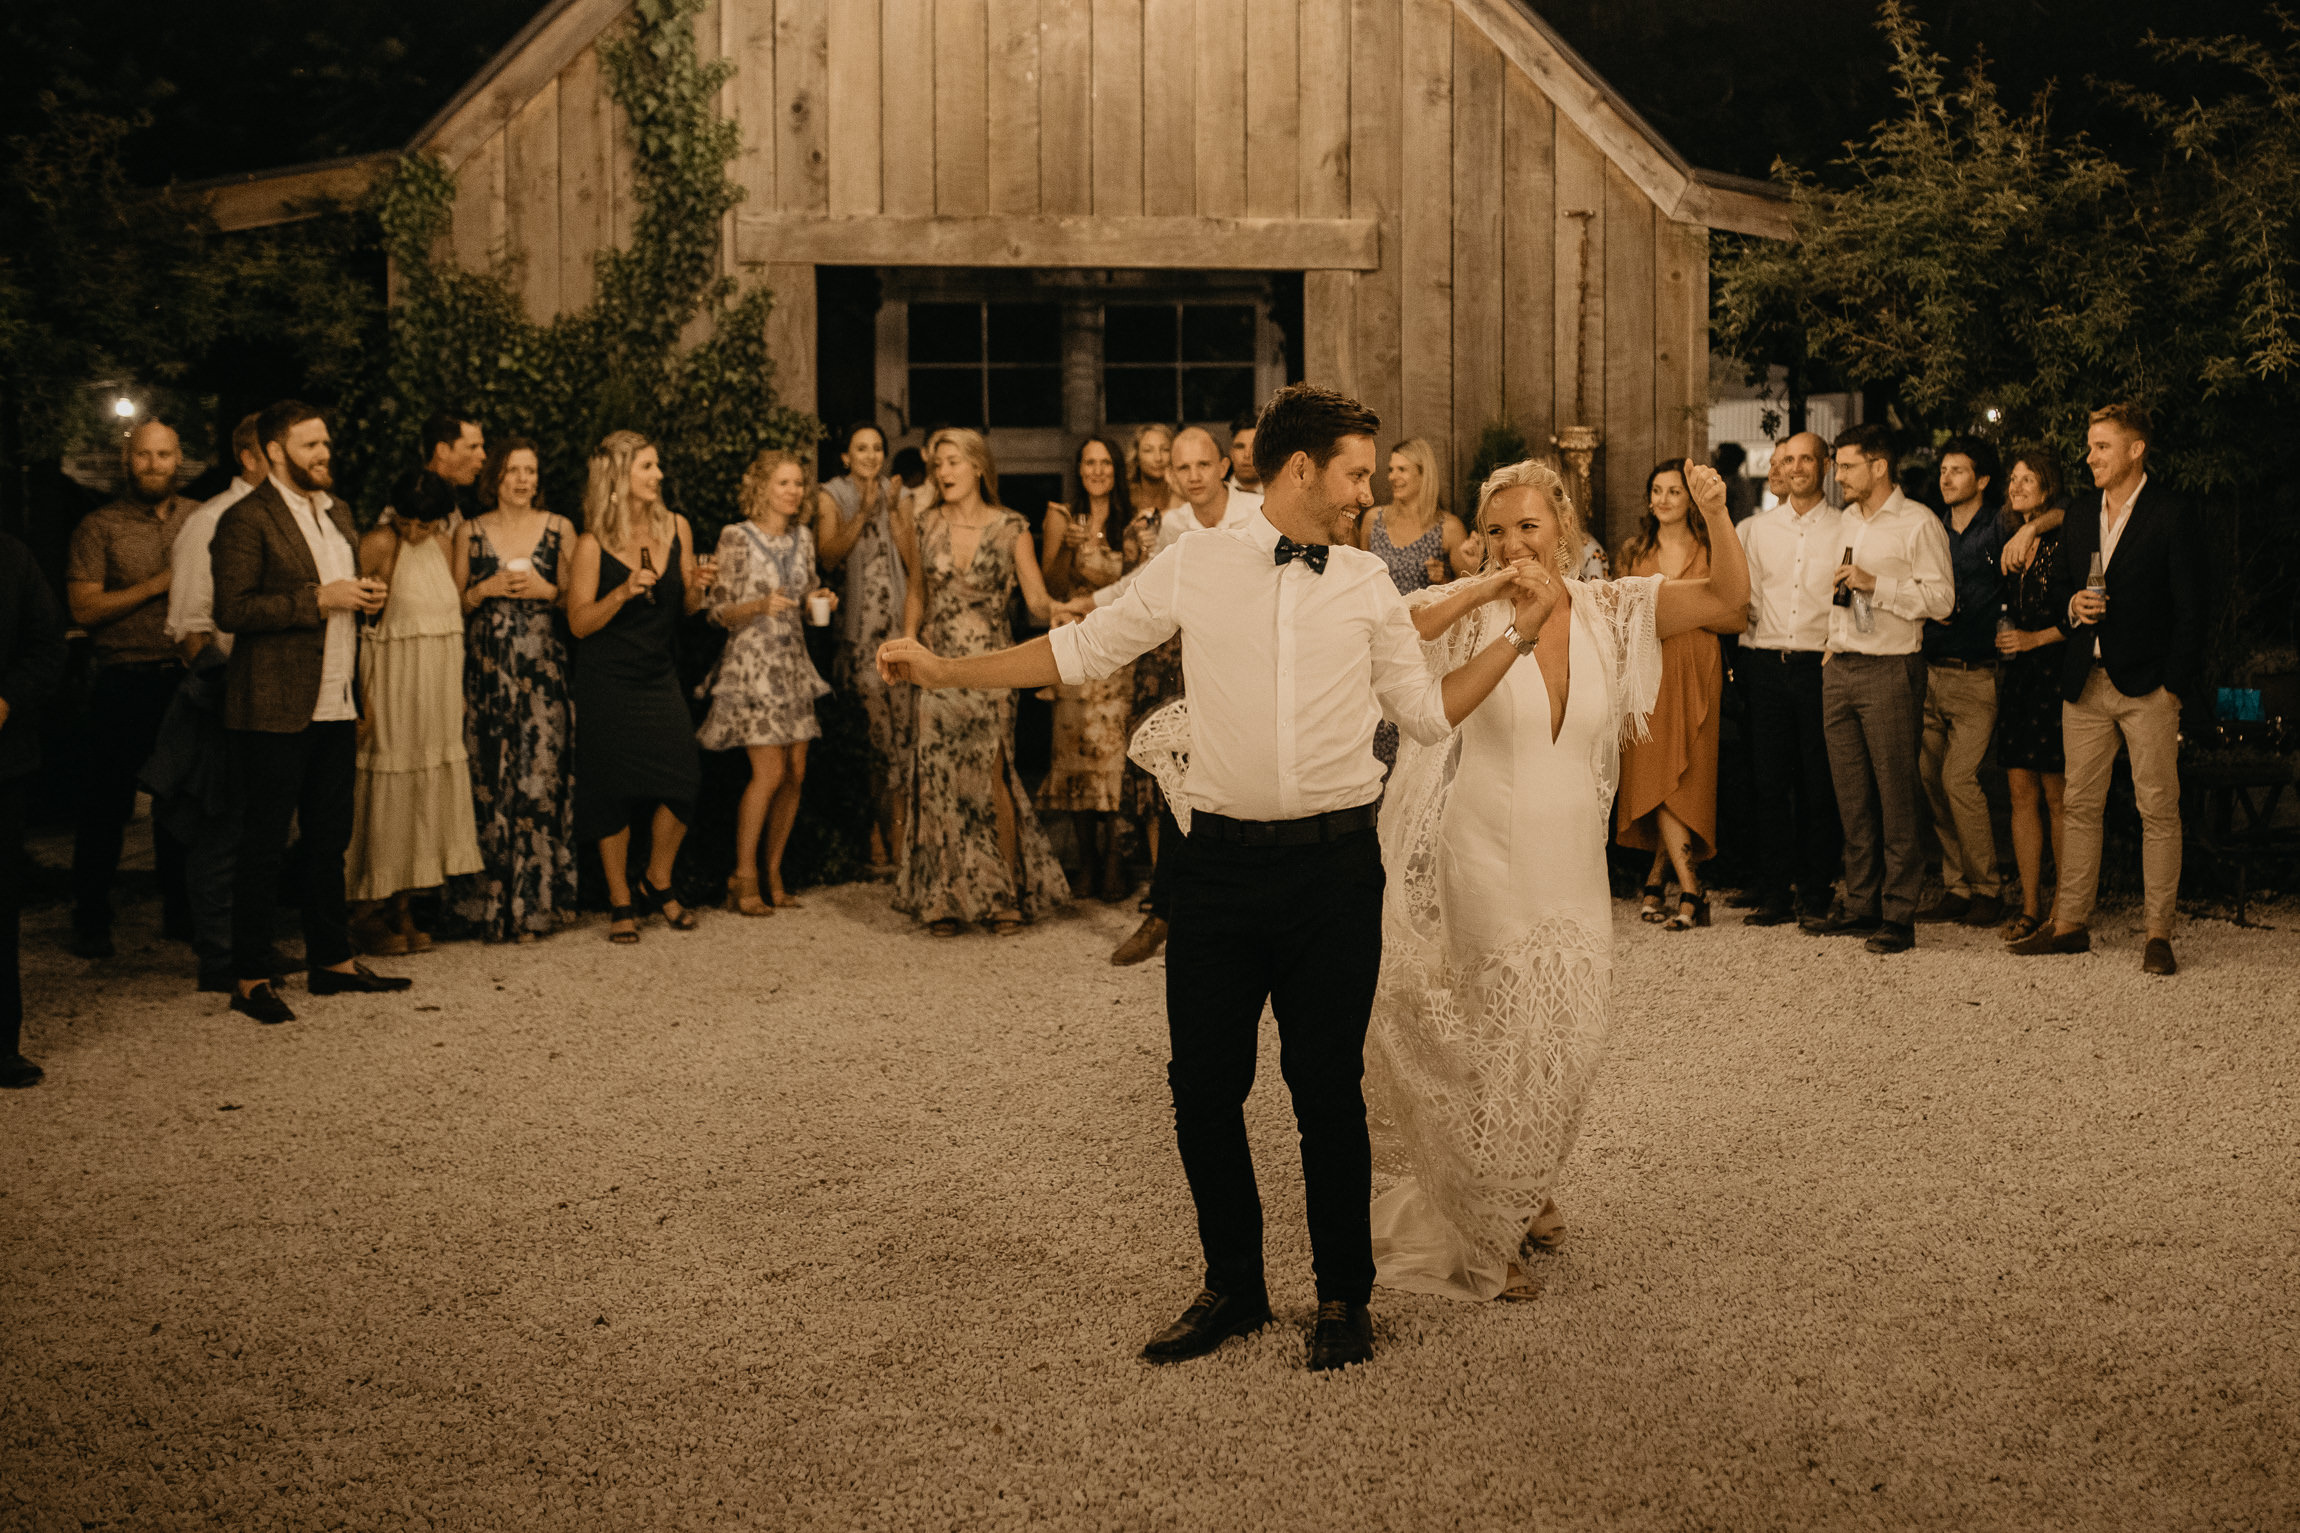 oldforestschool-wedding-blog-196.jpg